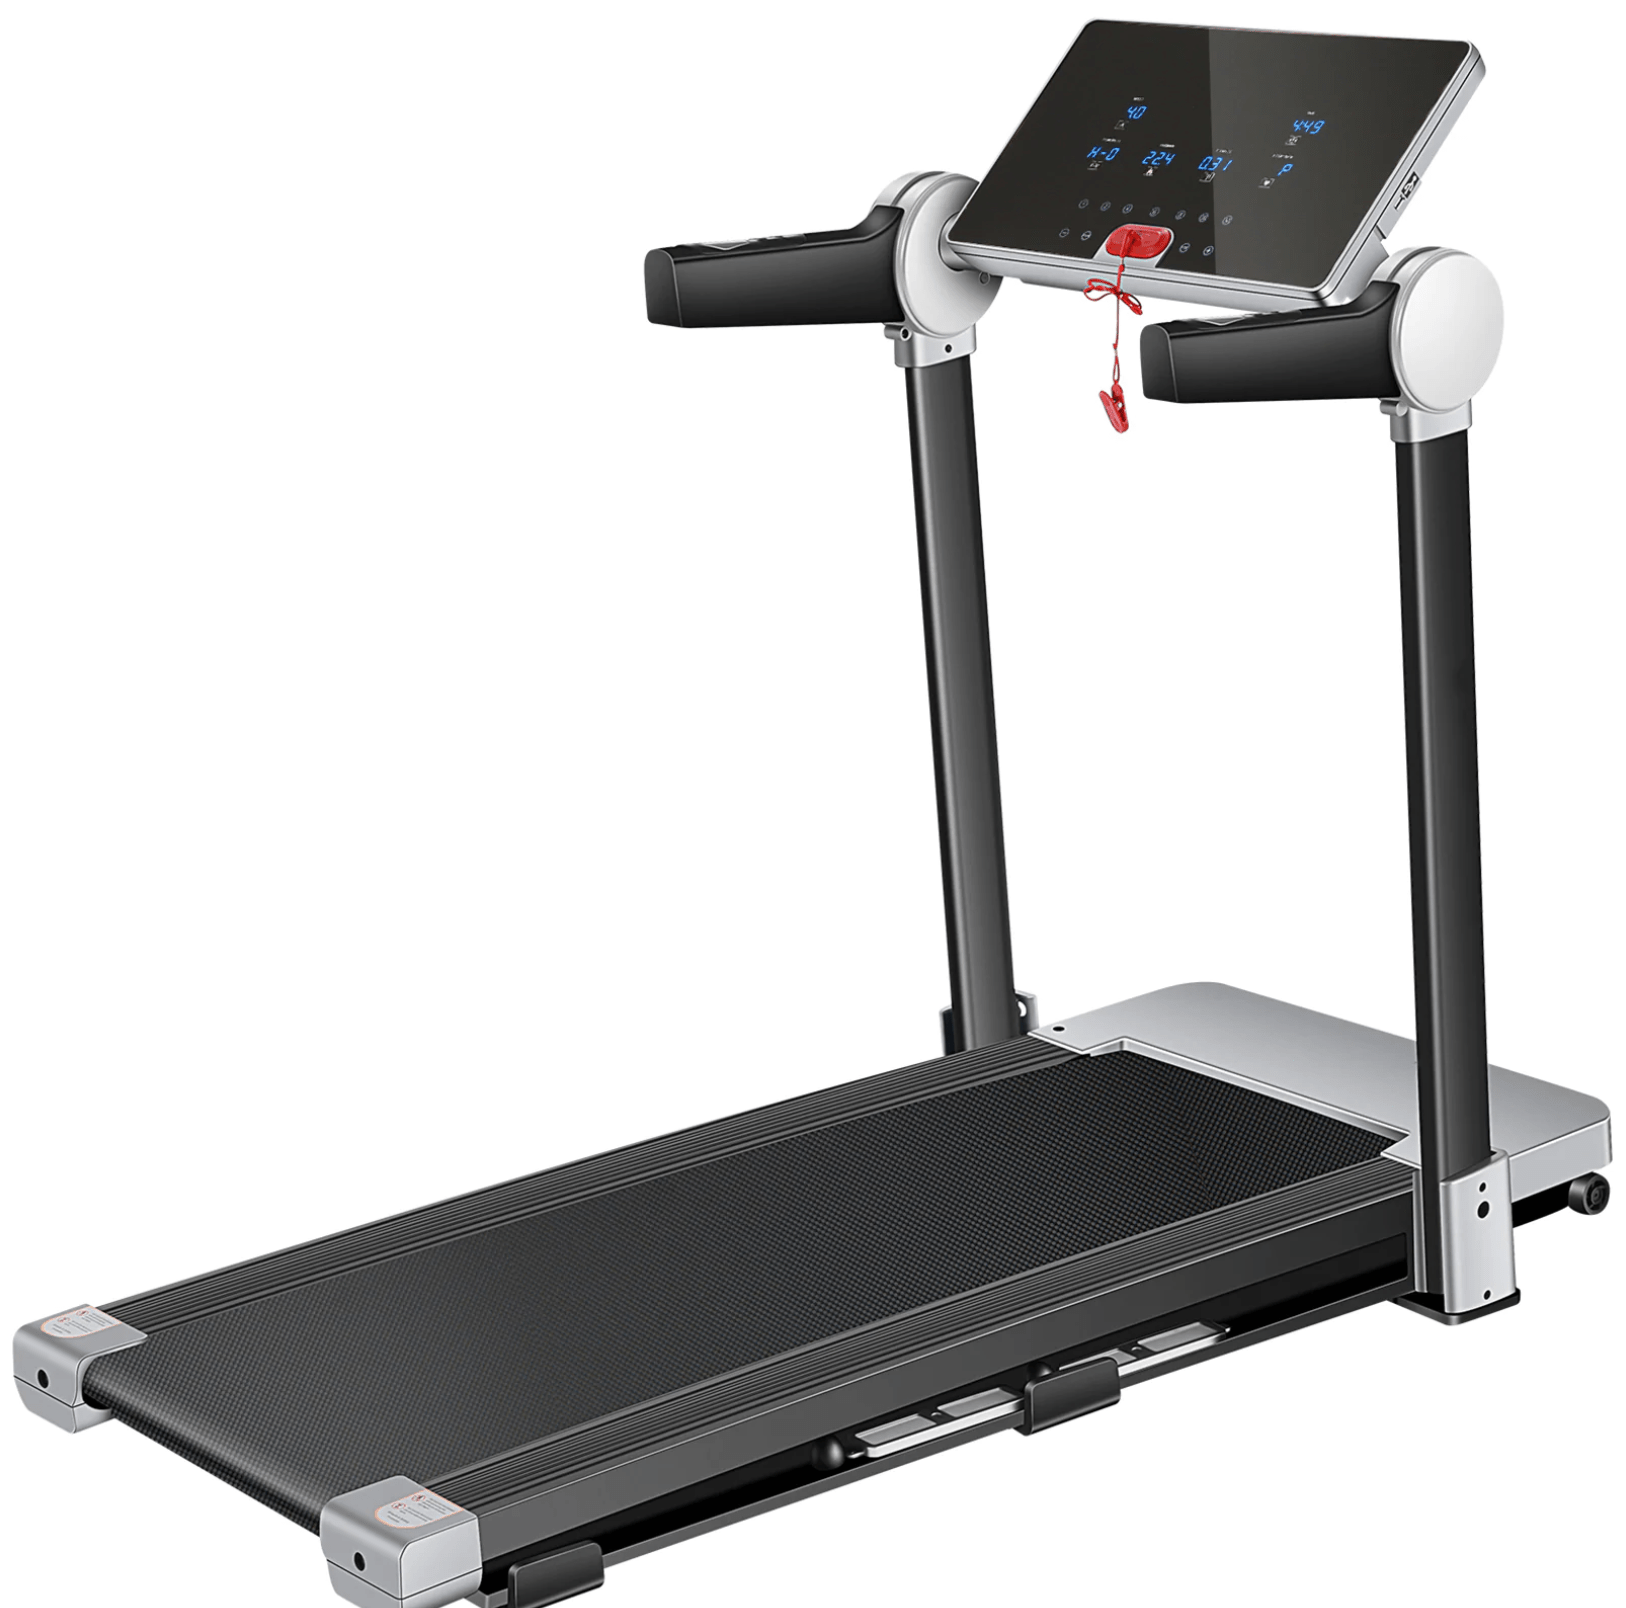 Folding Treadmill Home Gym Running Machine 12 Pre-Programs 3.0HP